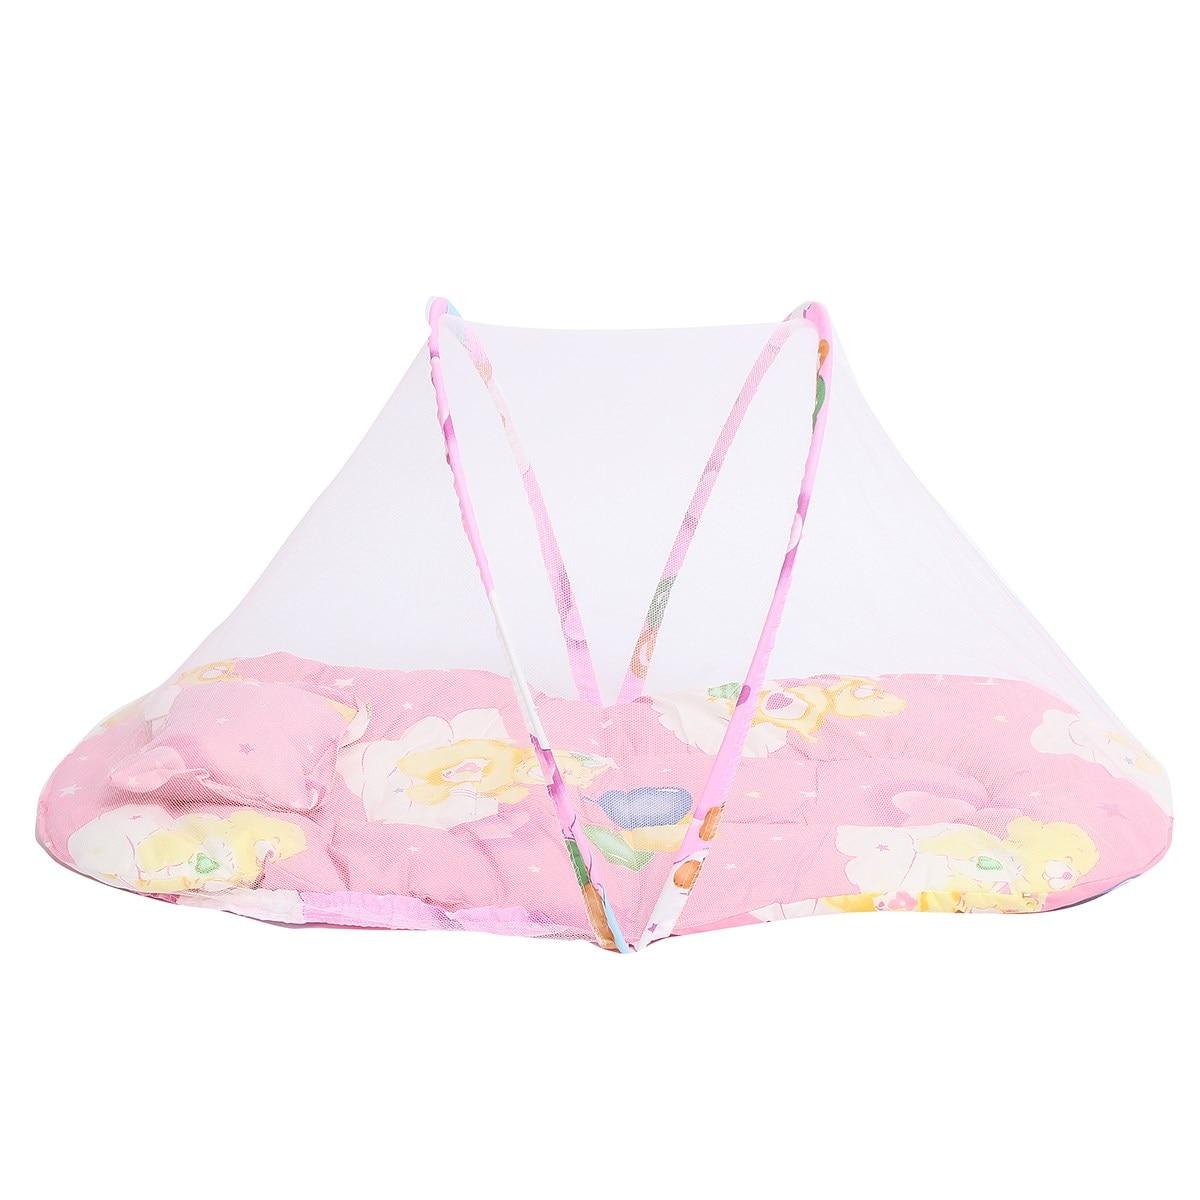 Baby bed camping - Baby Bed Camping